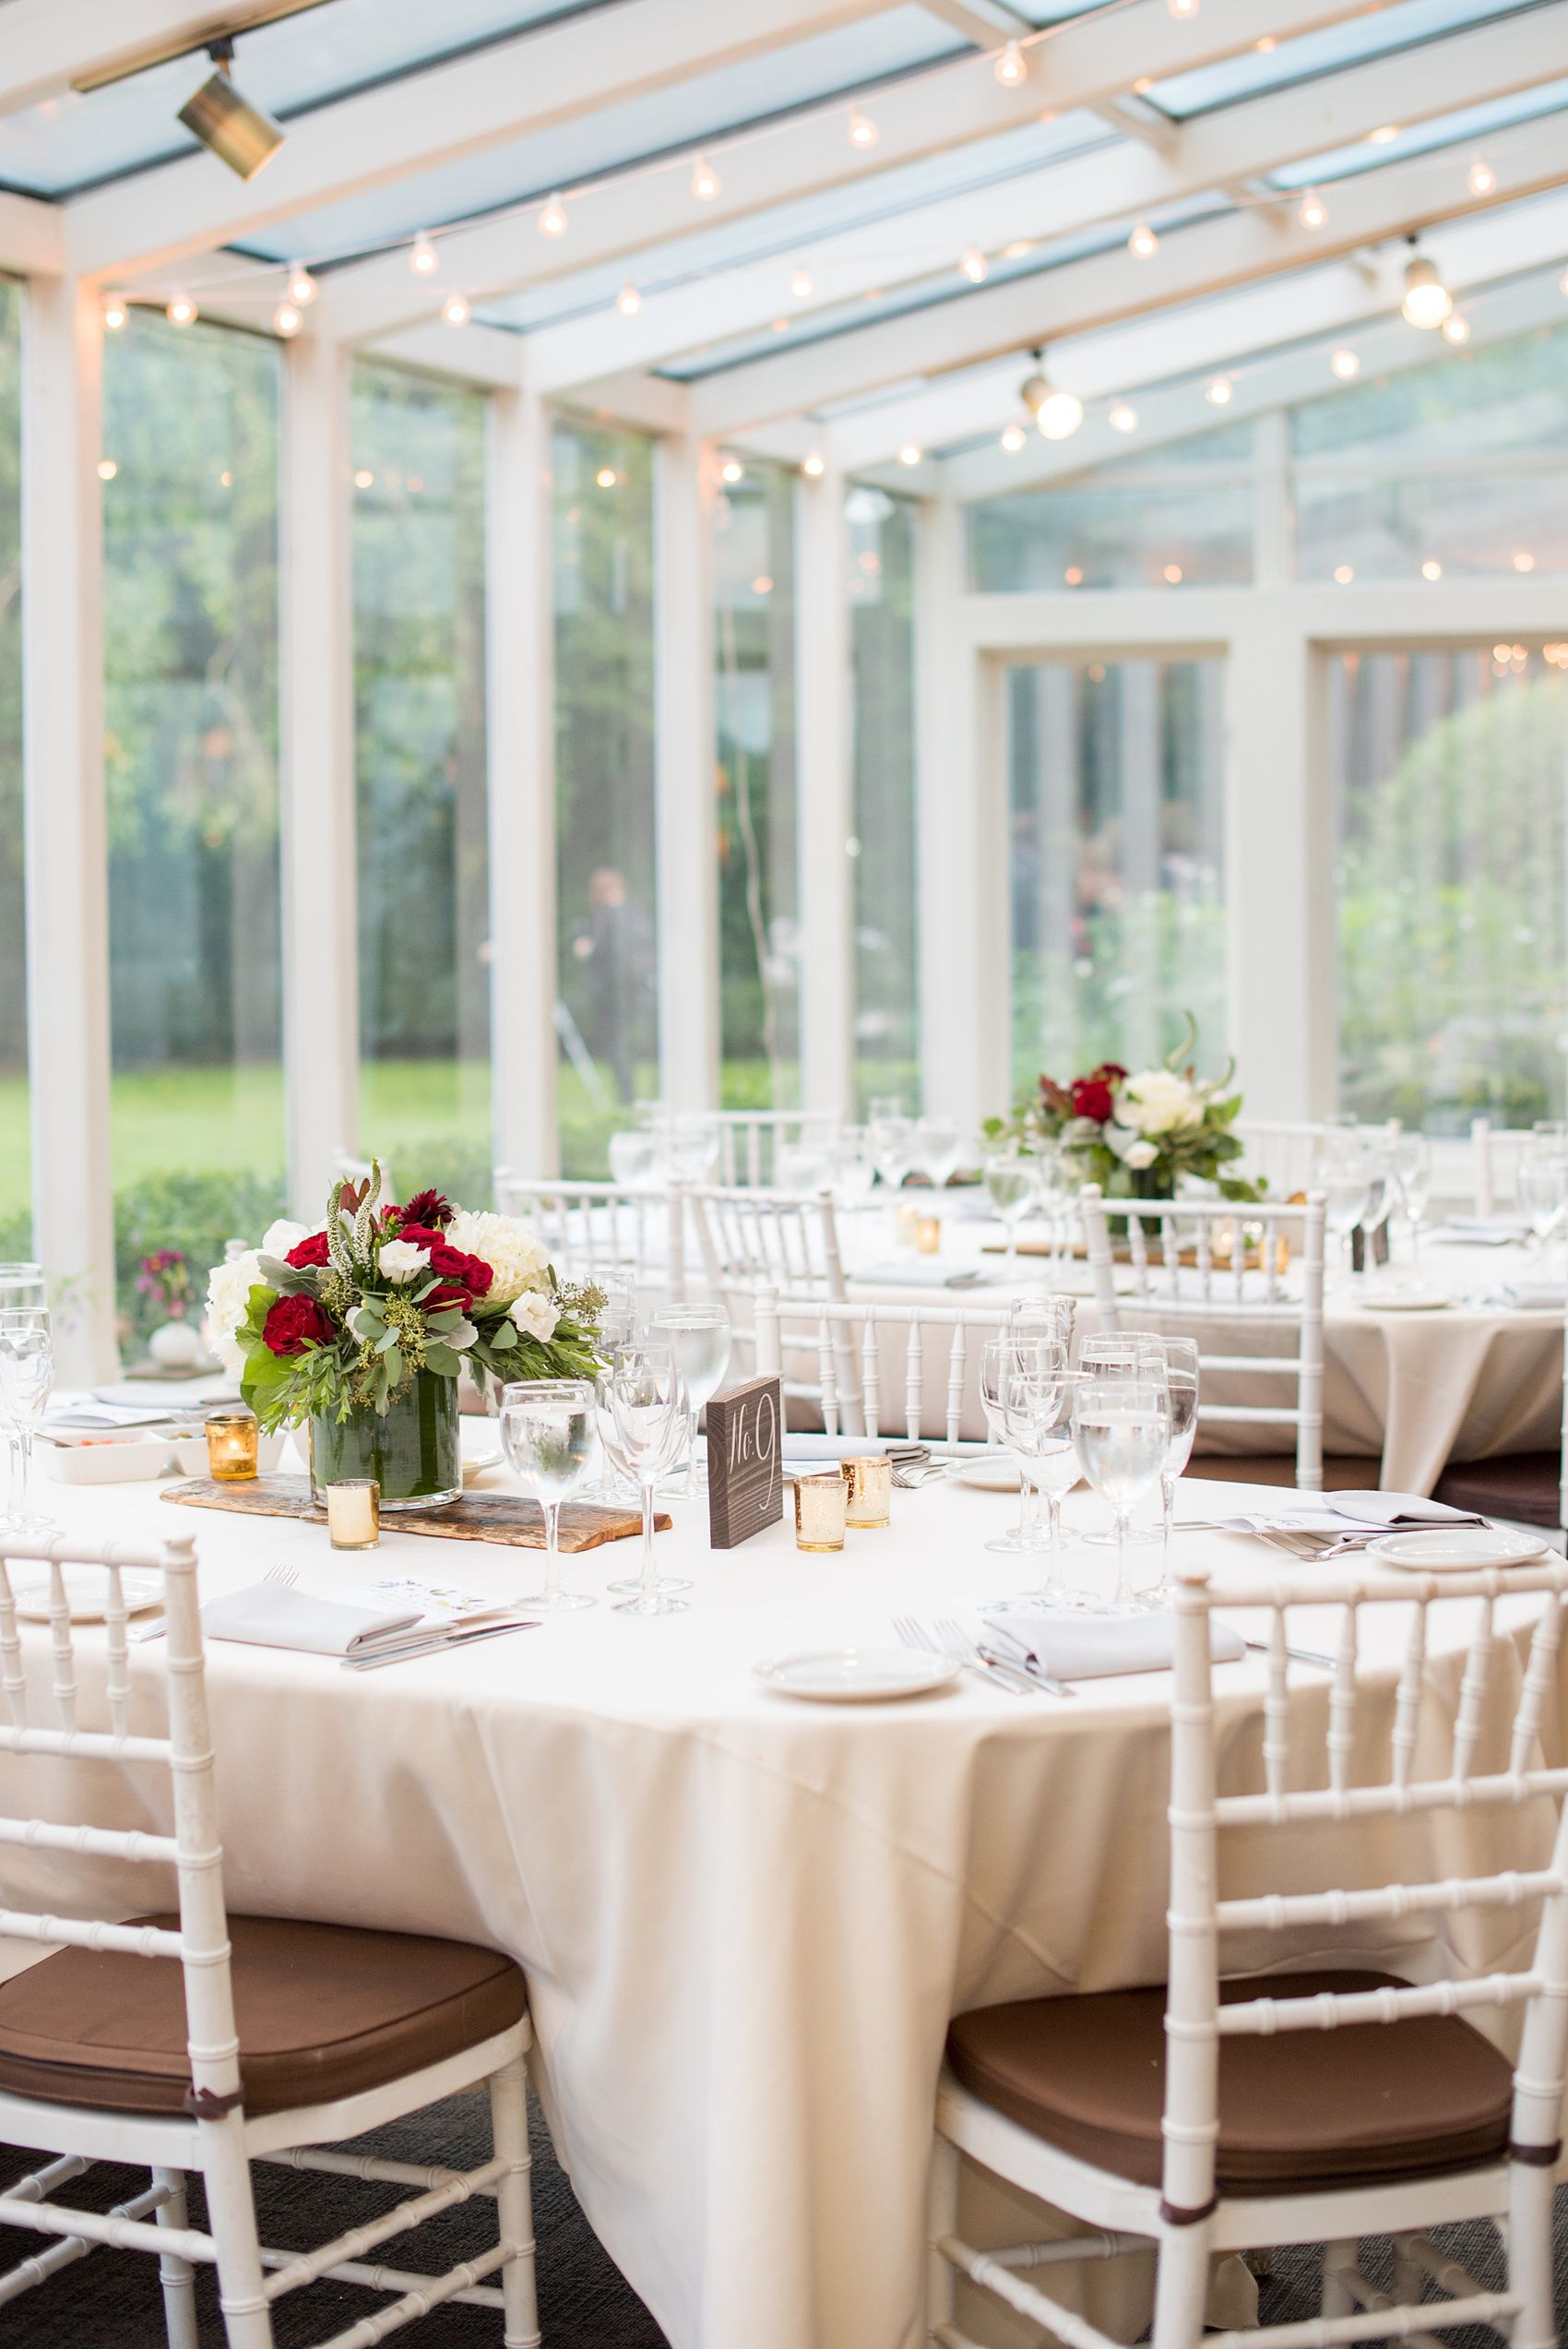 Crabtree's Kittle House Wedding Photos near New York City